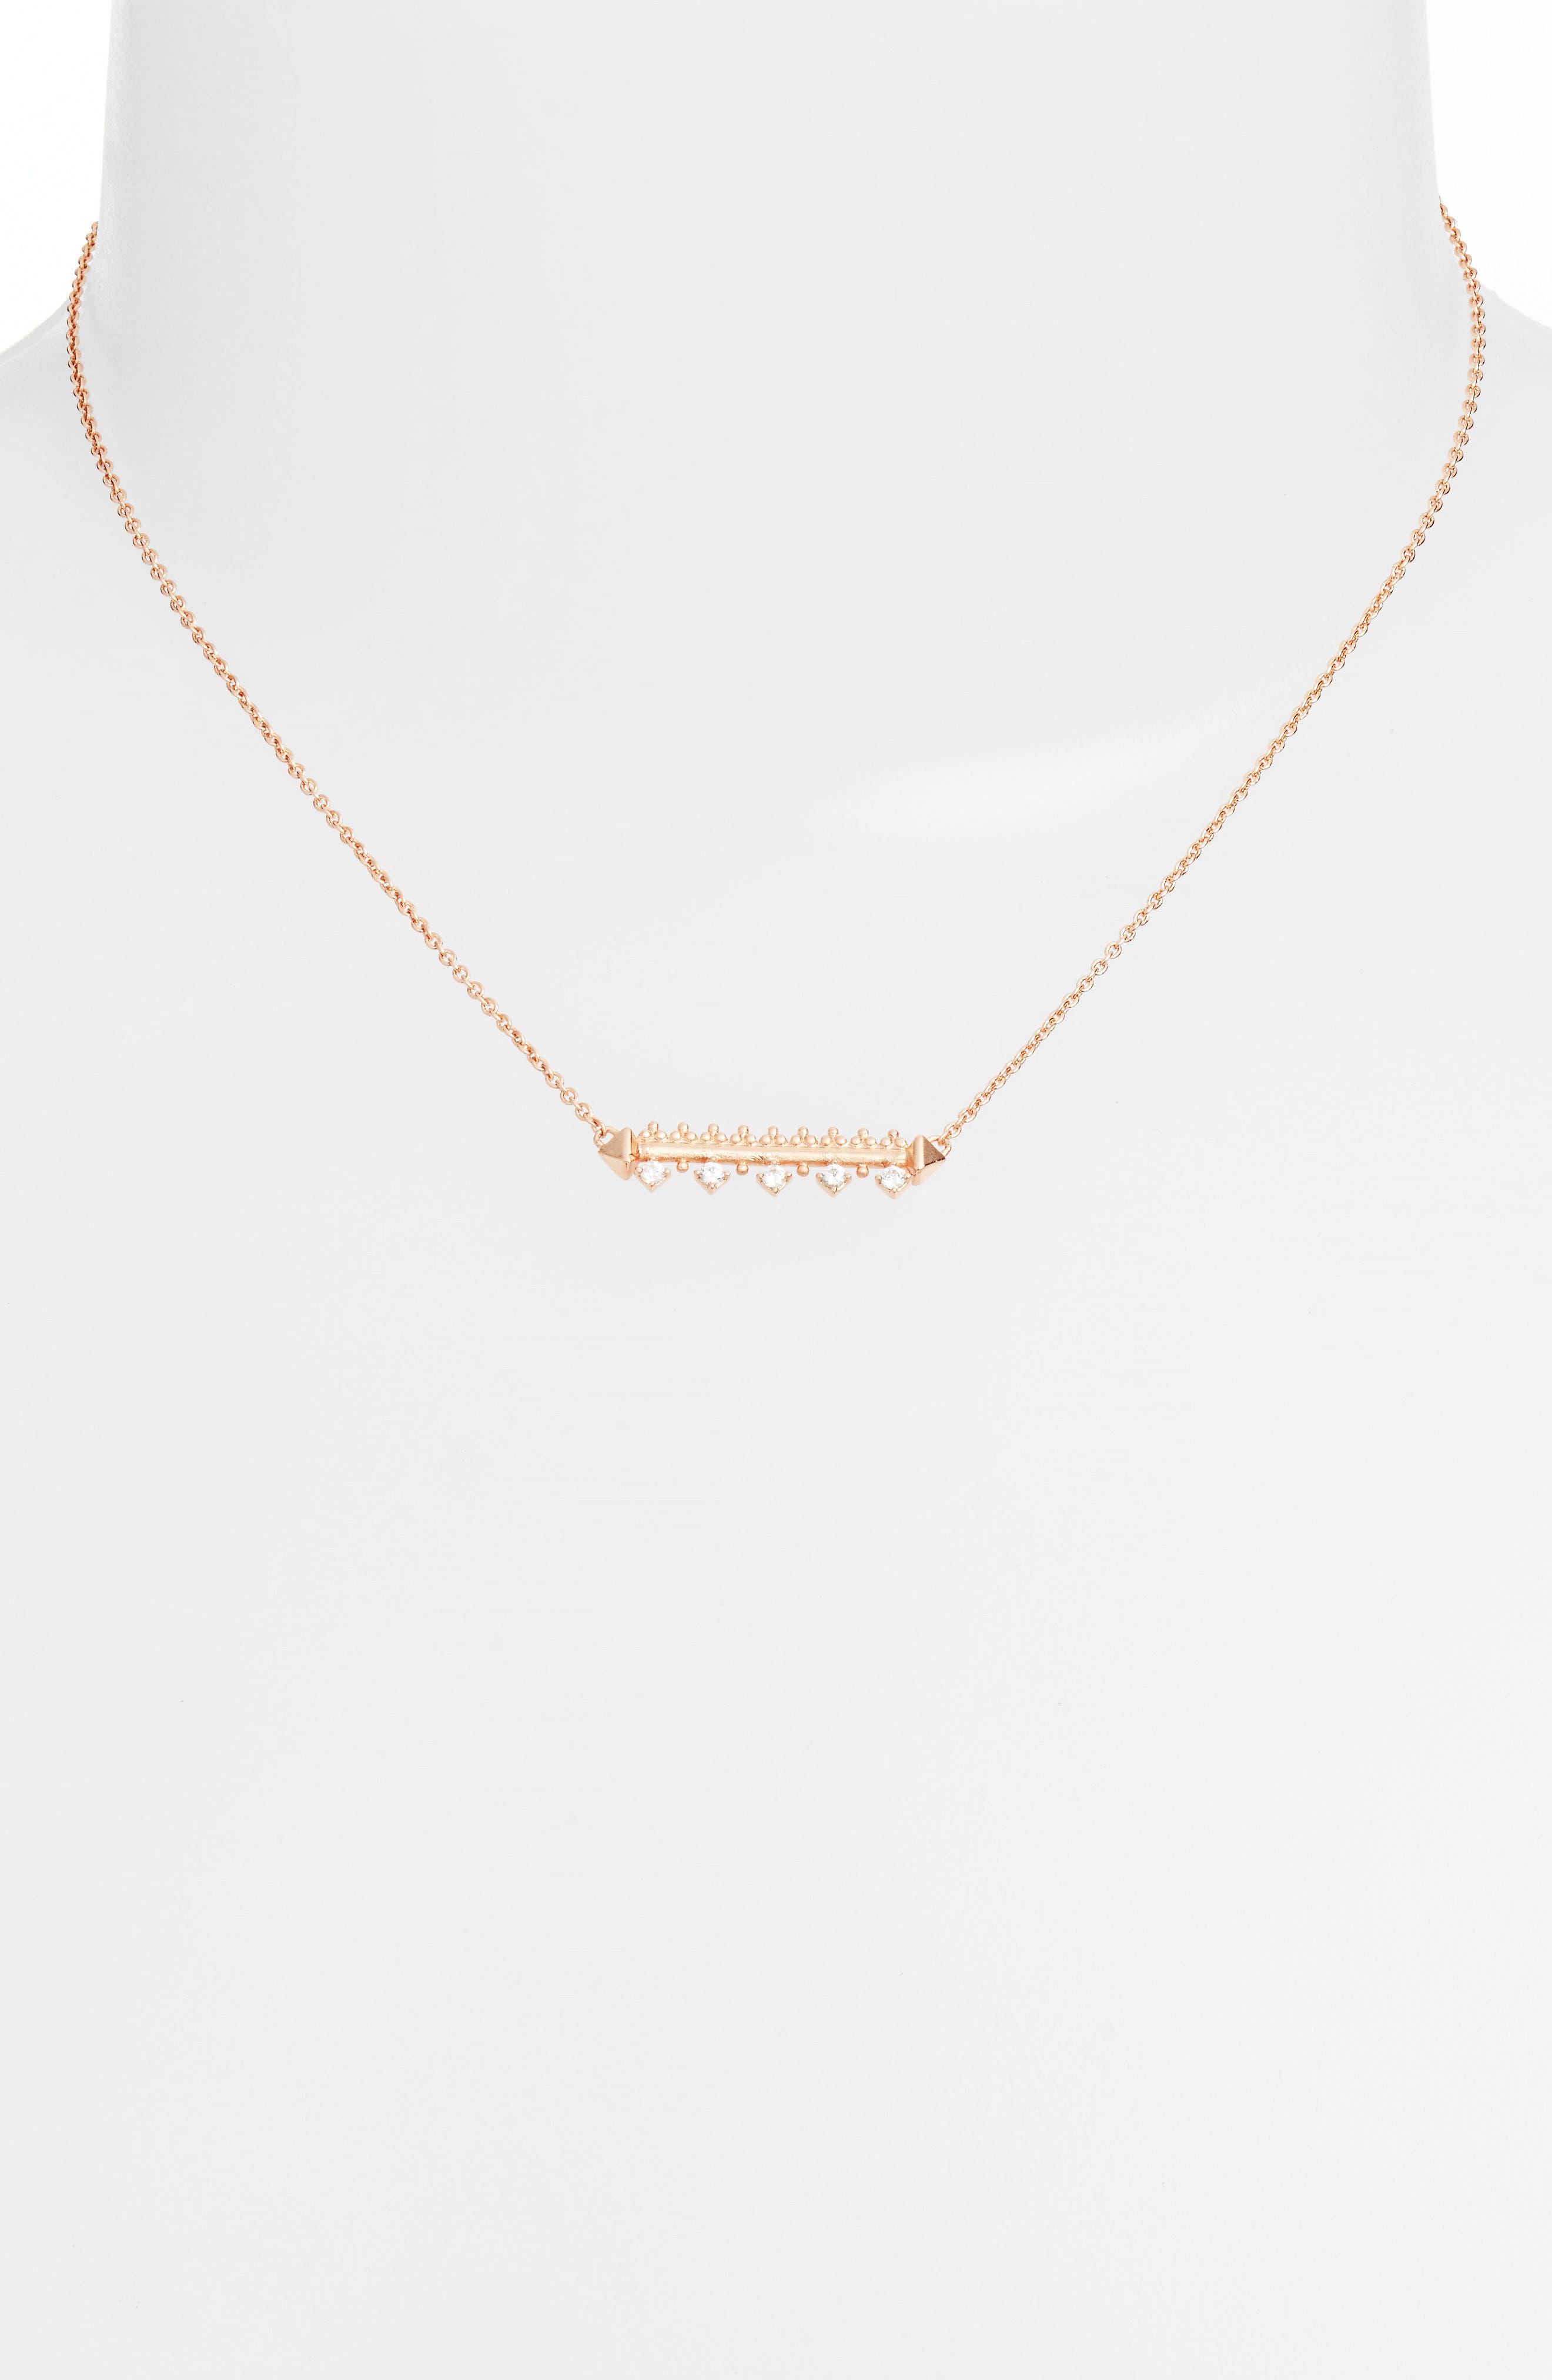 Kendra Scott Anissa Bar Pendant Necklace